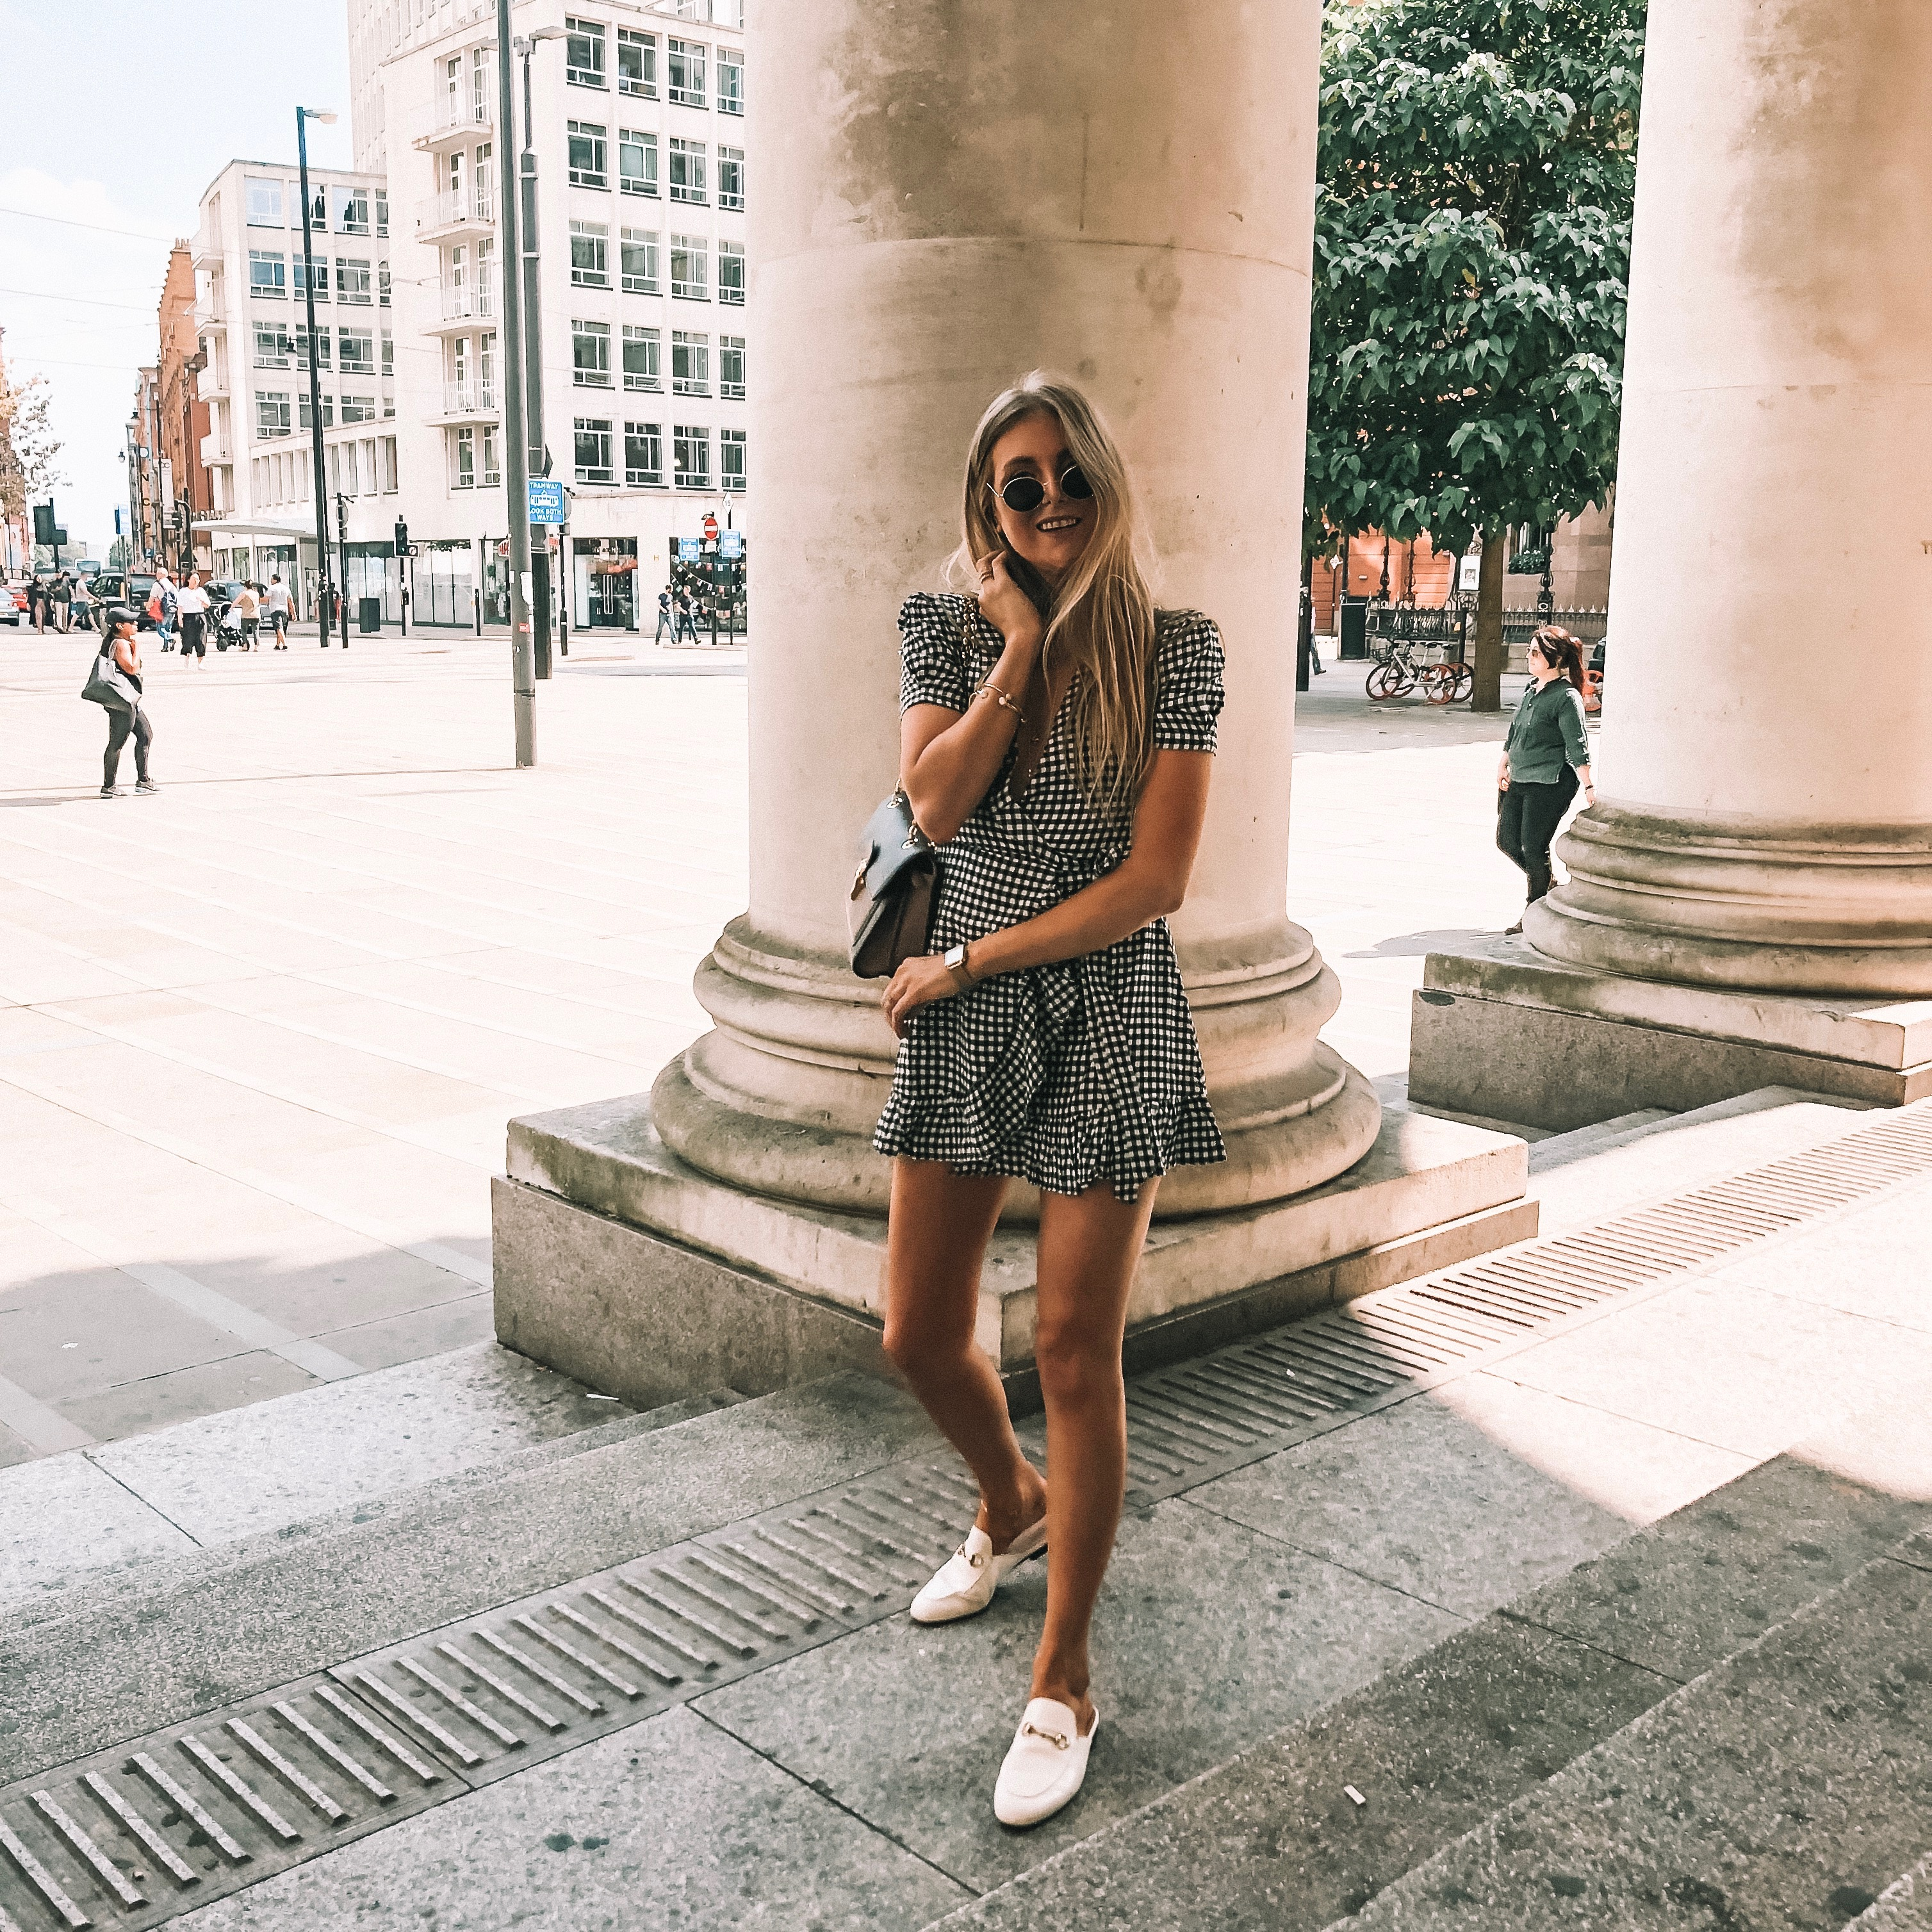 Revolve Summer Street Style - Fashion Blogger Sinead Crowe